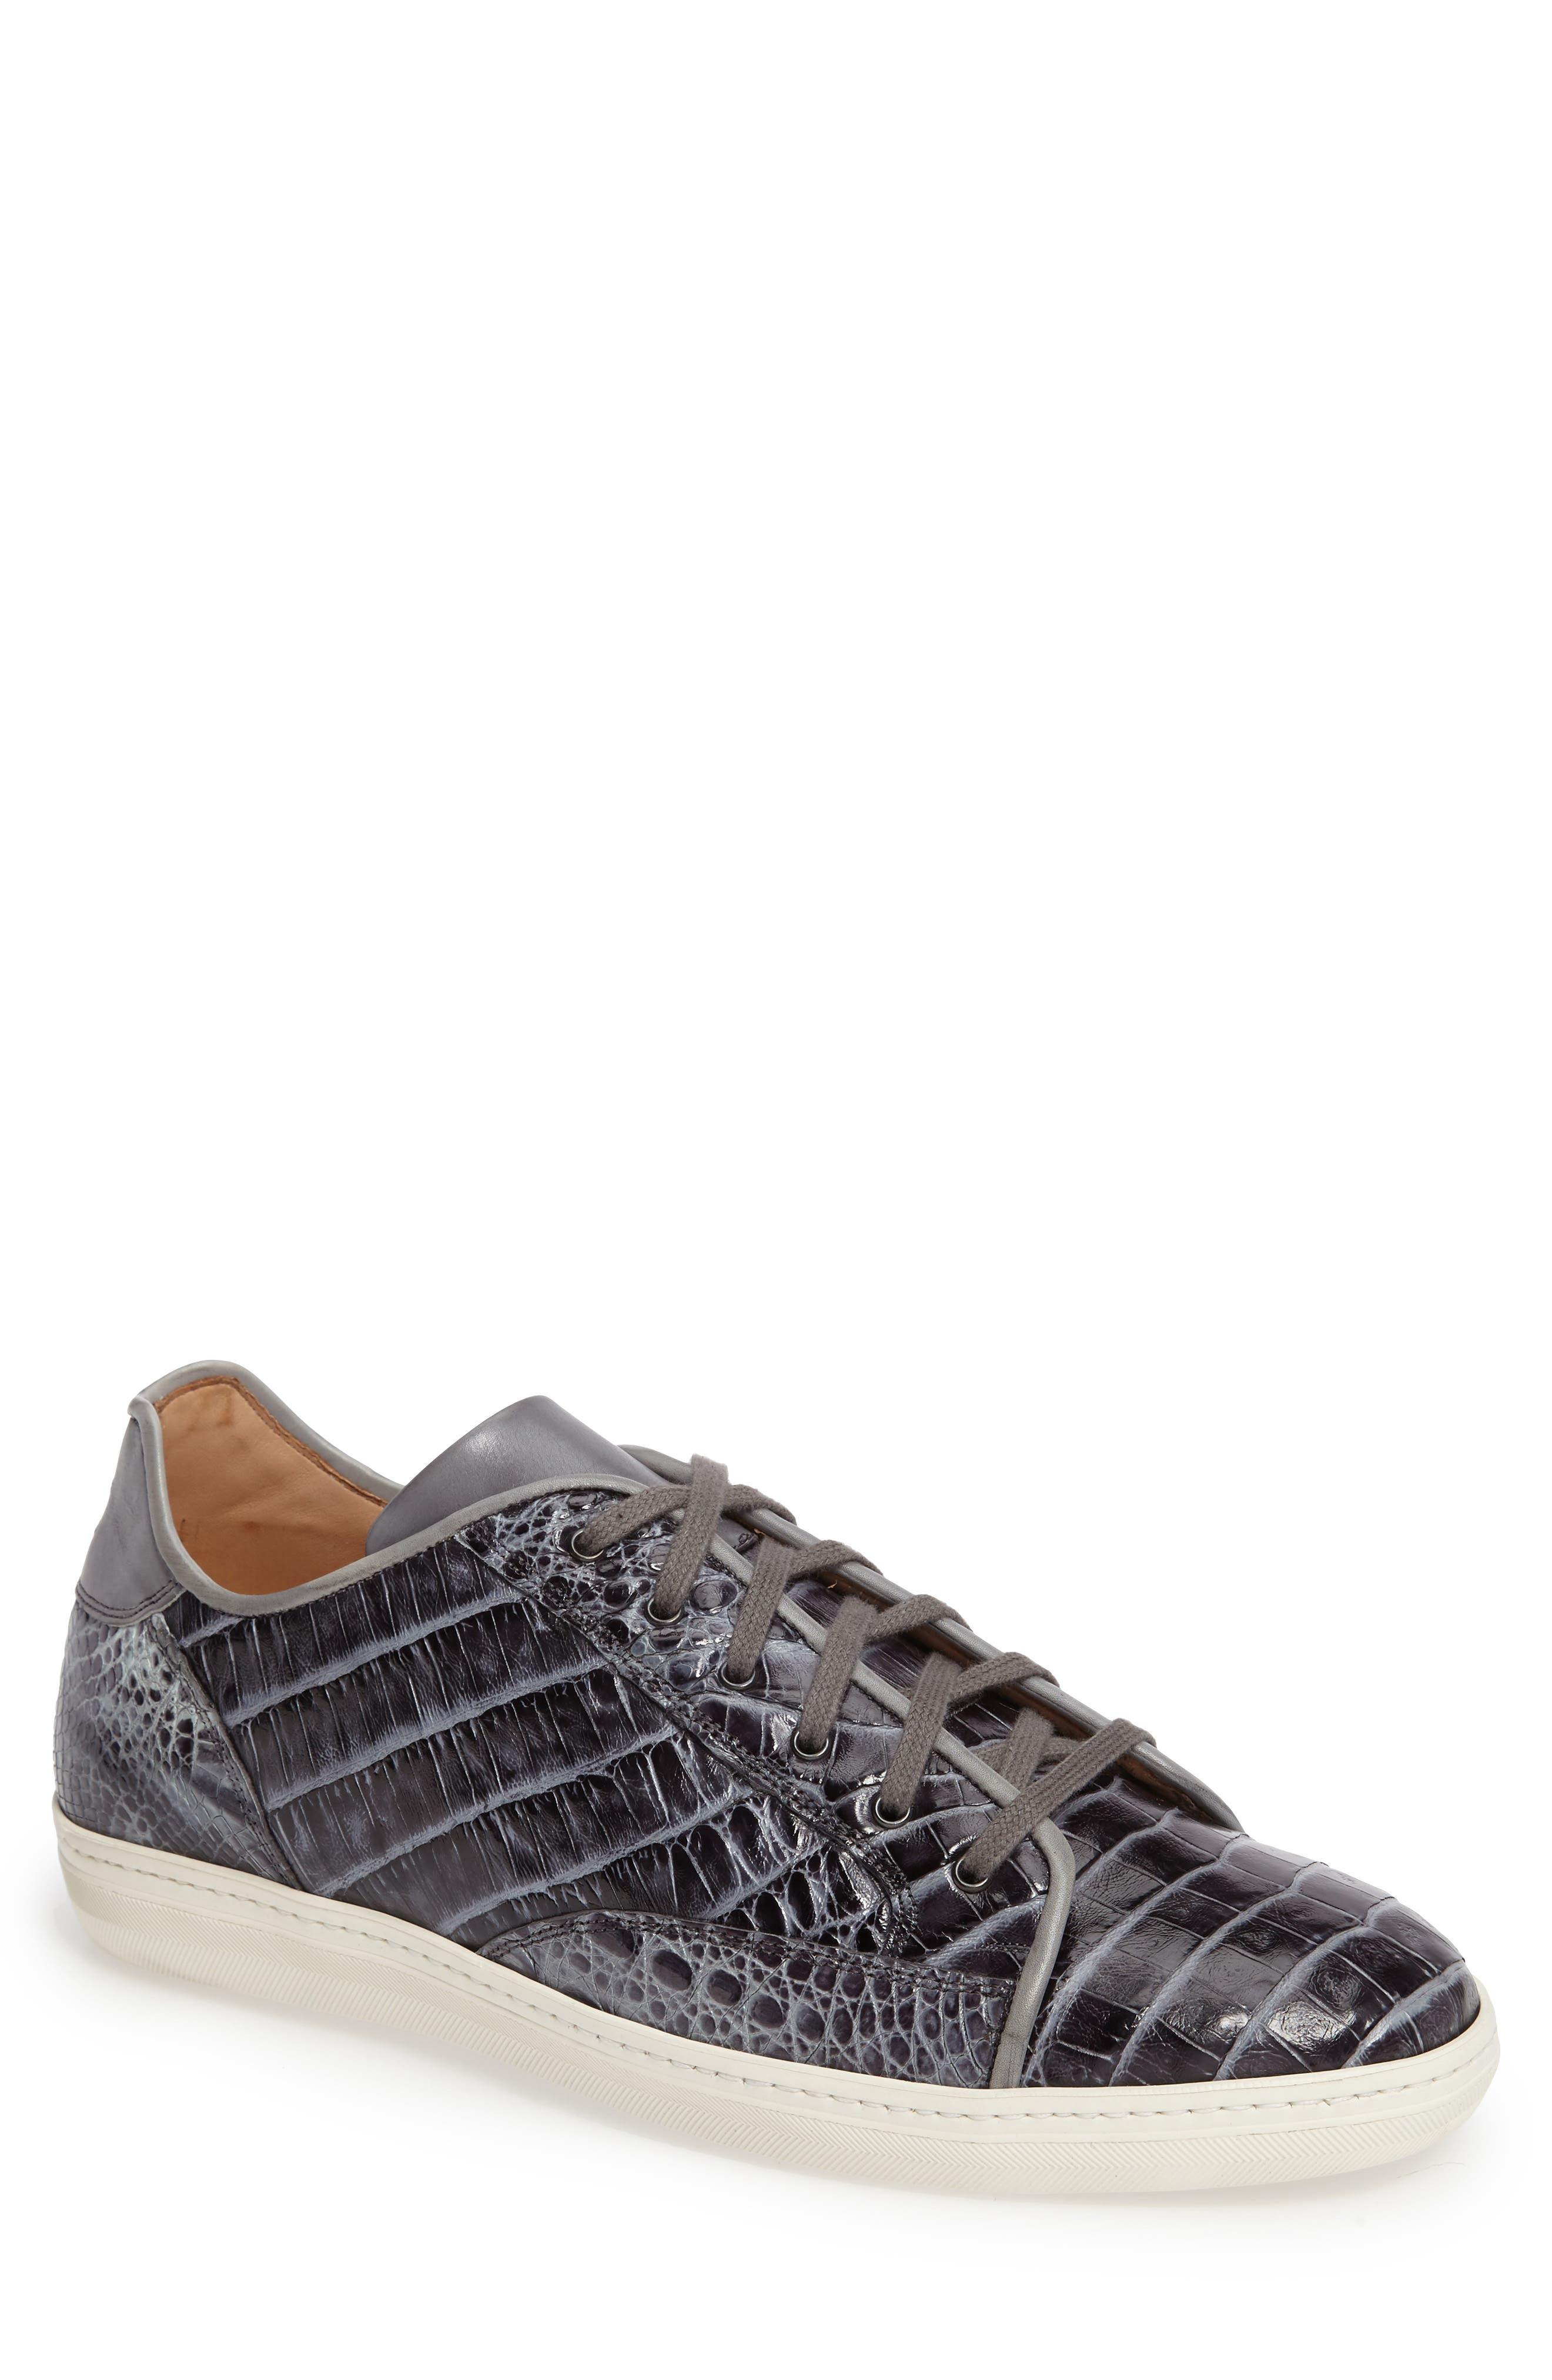 Hickman Genuine Crocodile Sneaker,                             Main thumbnail 1, color,                             020